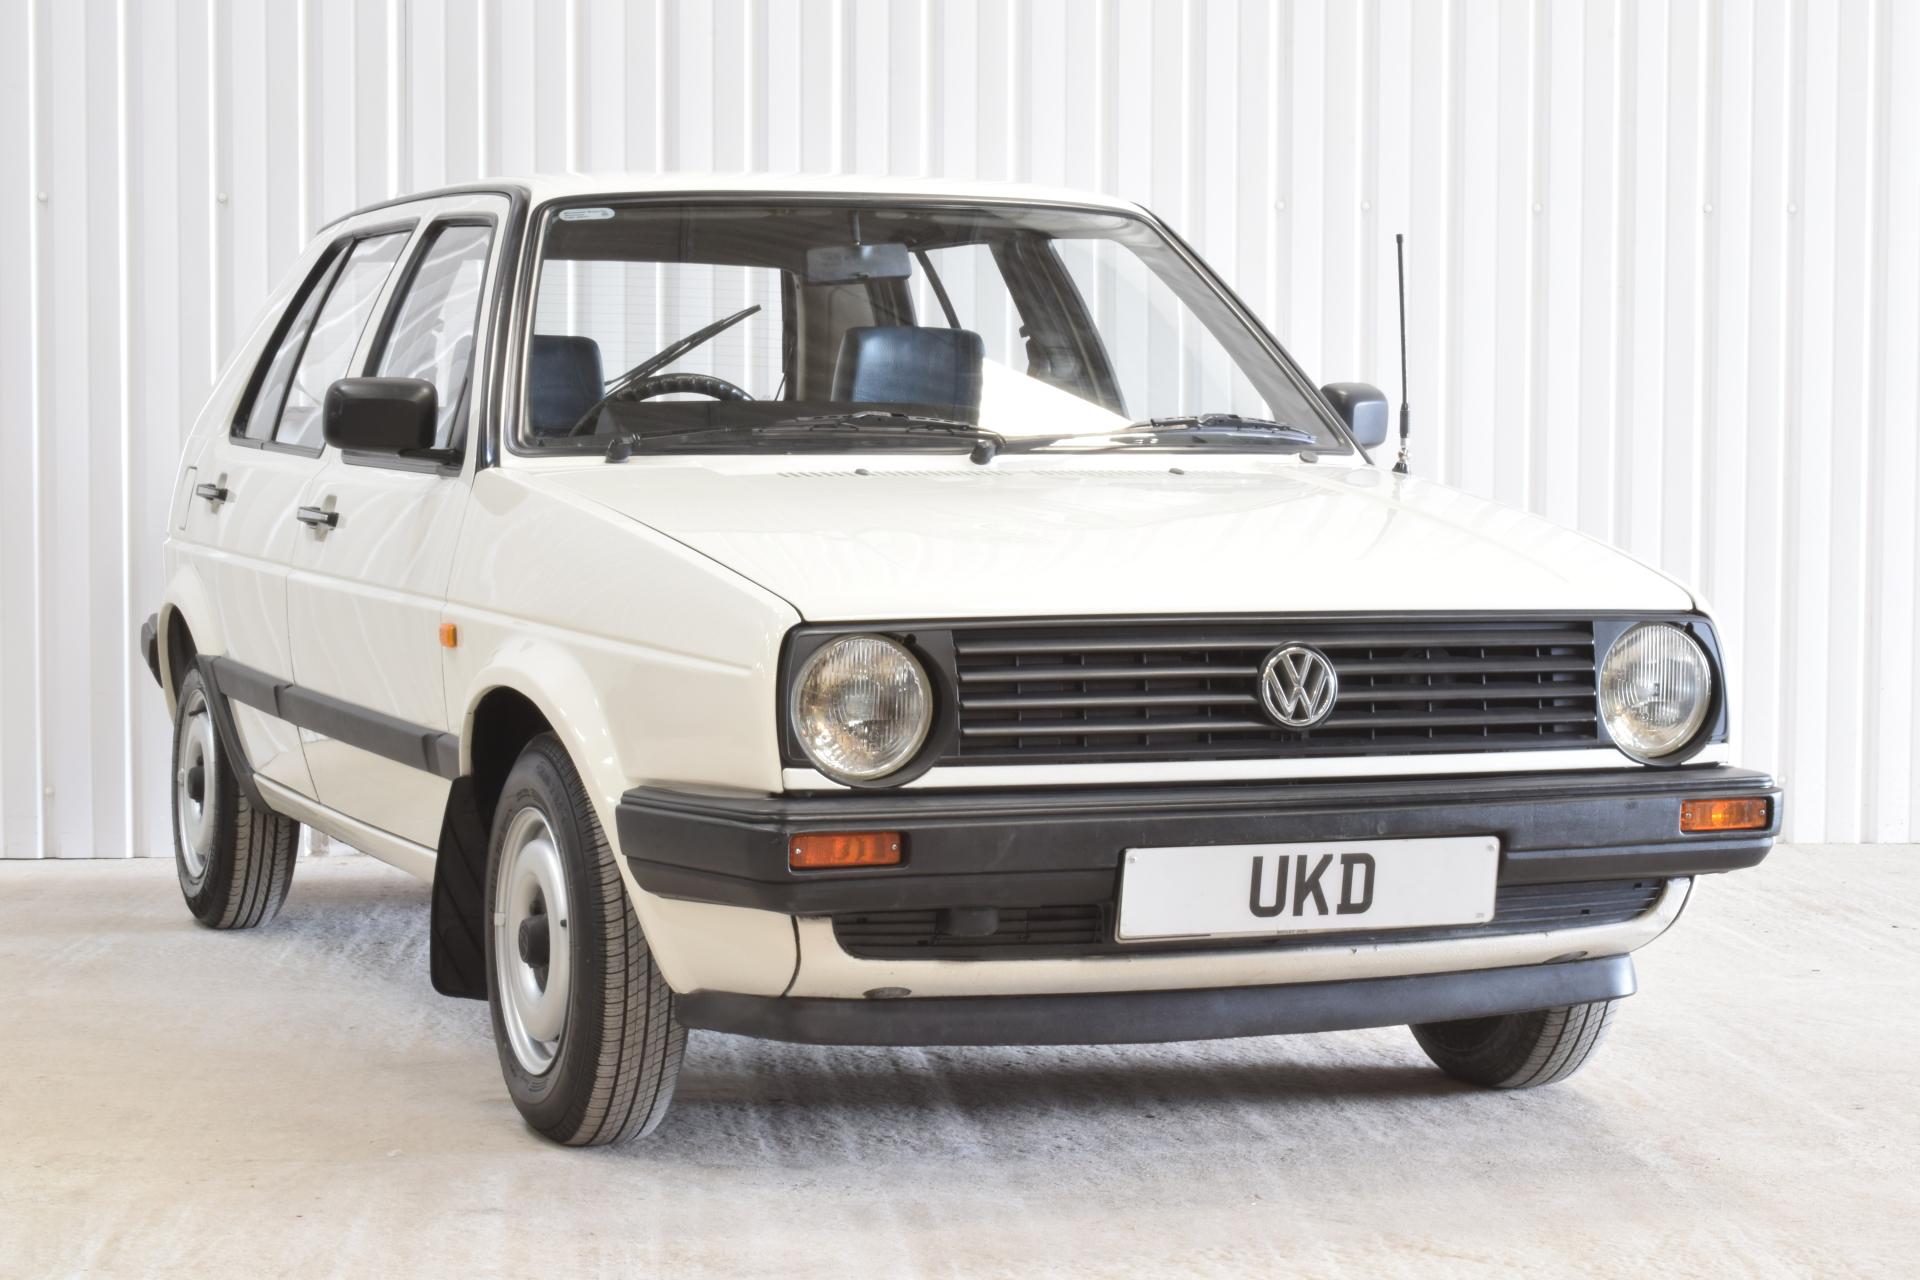 VW GOLF MK2 1.3 5DR WHITE 1988